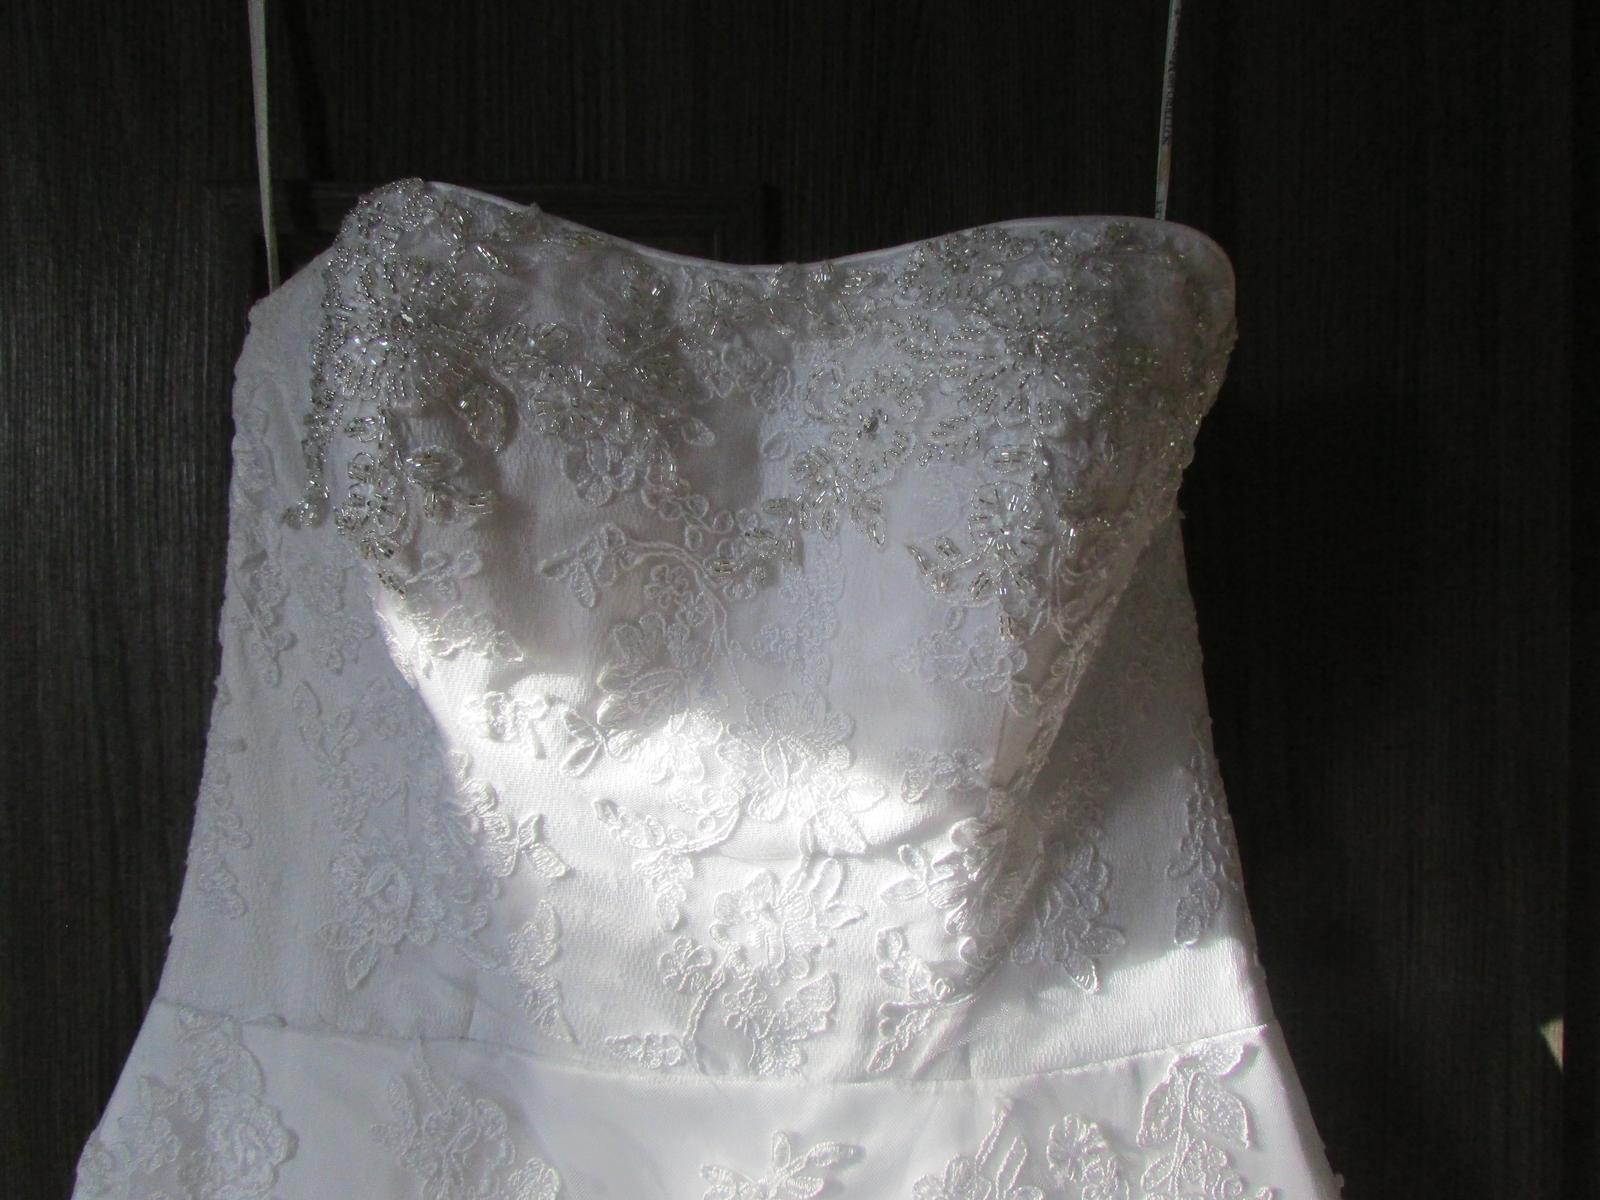 svadobné šaty s čipkovanou vlečkou - Obrázok č. 2